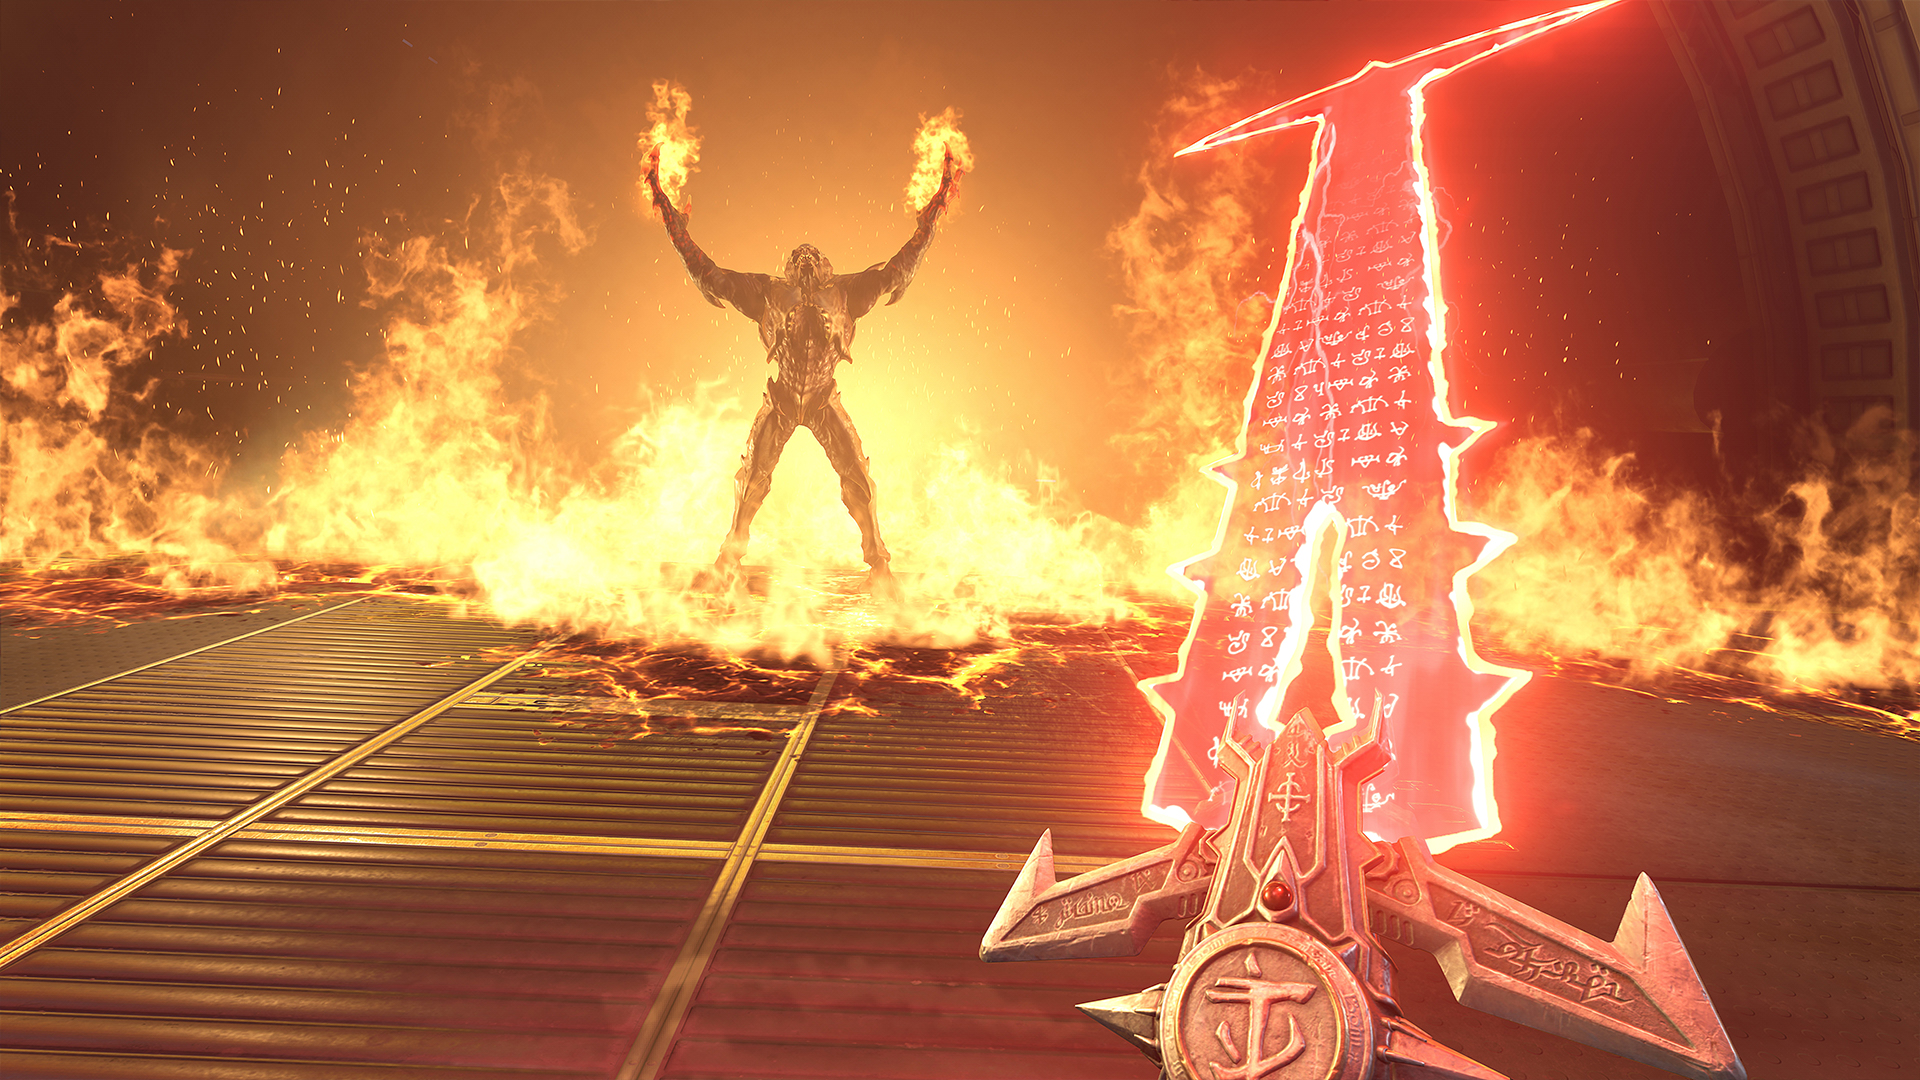 doom-eternal-crucible-blade.jpg